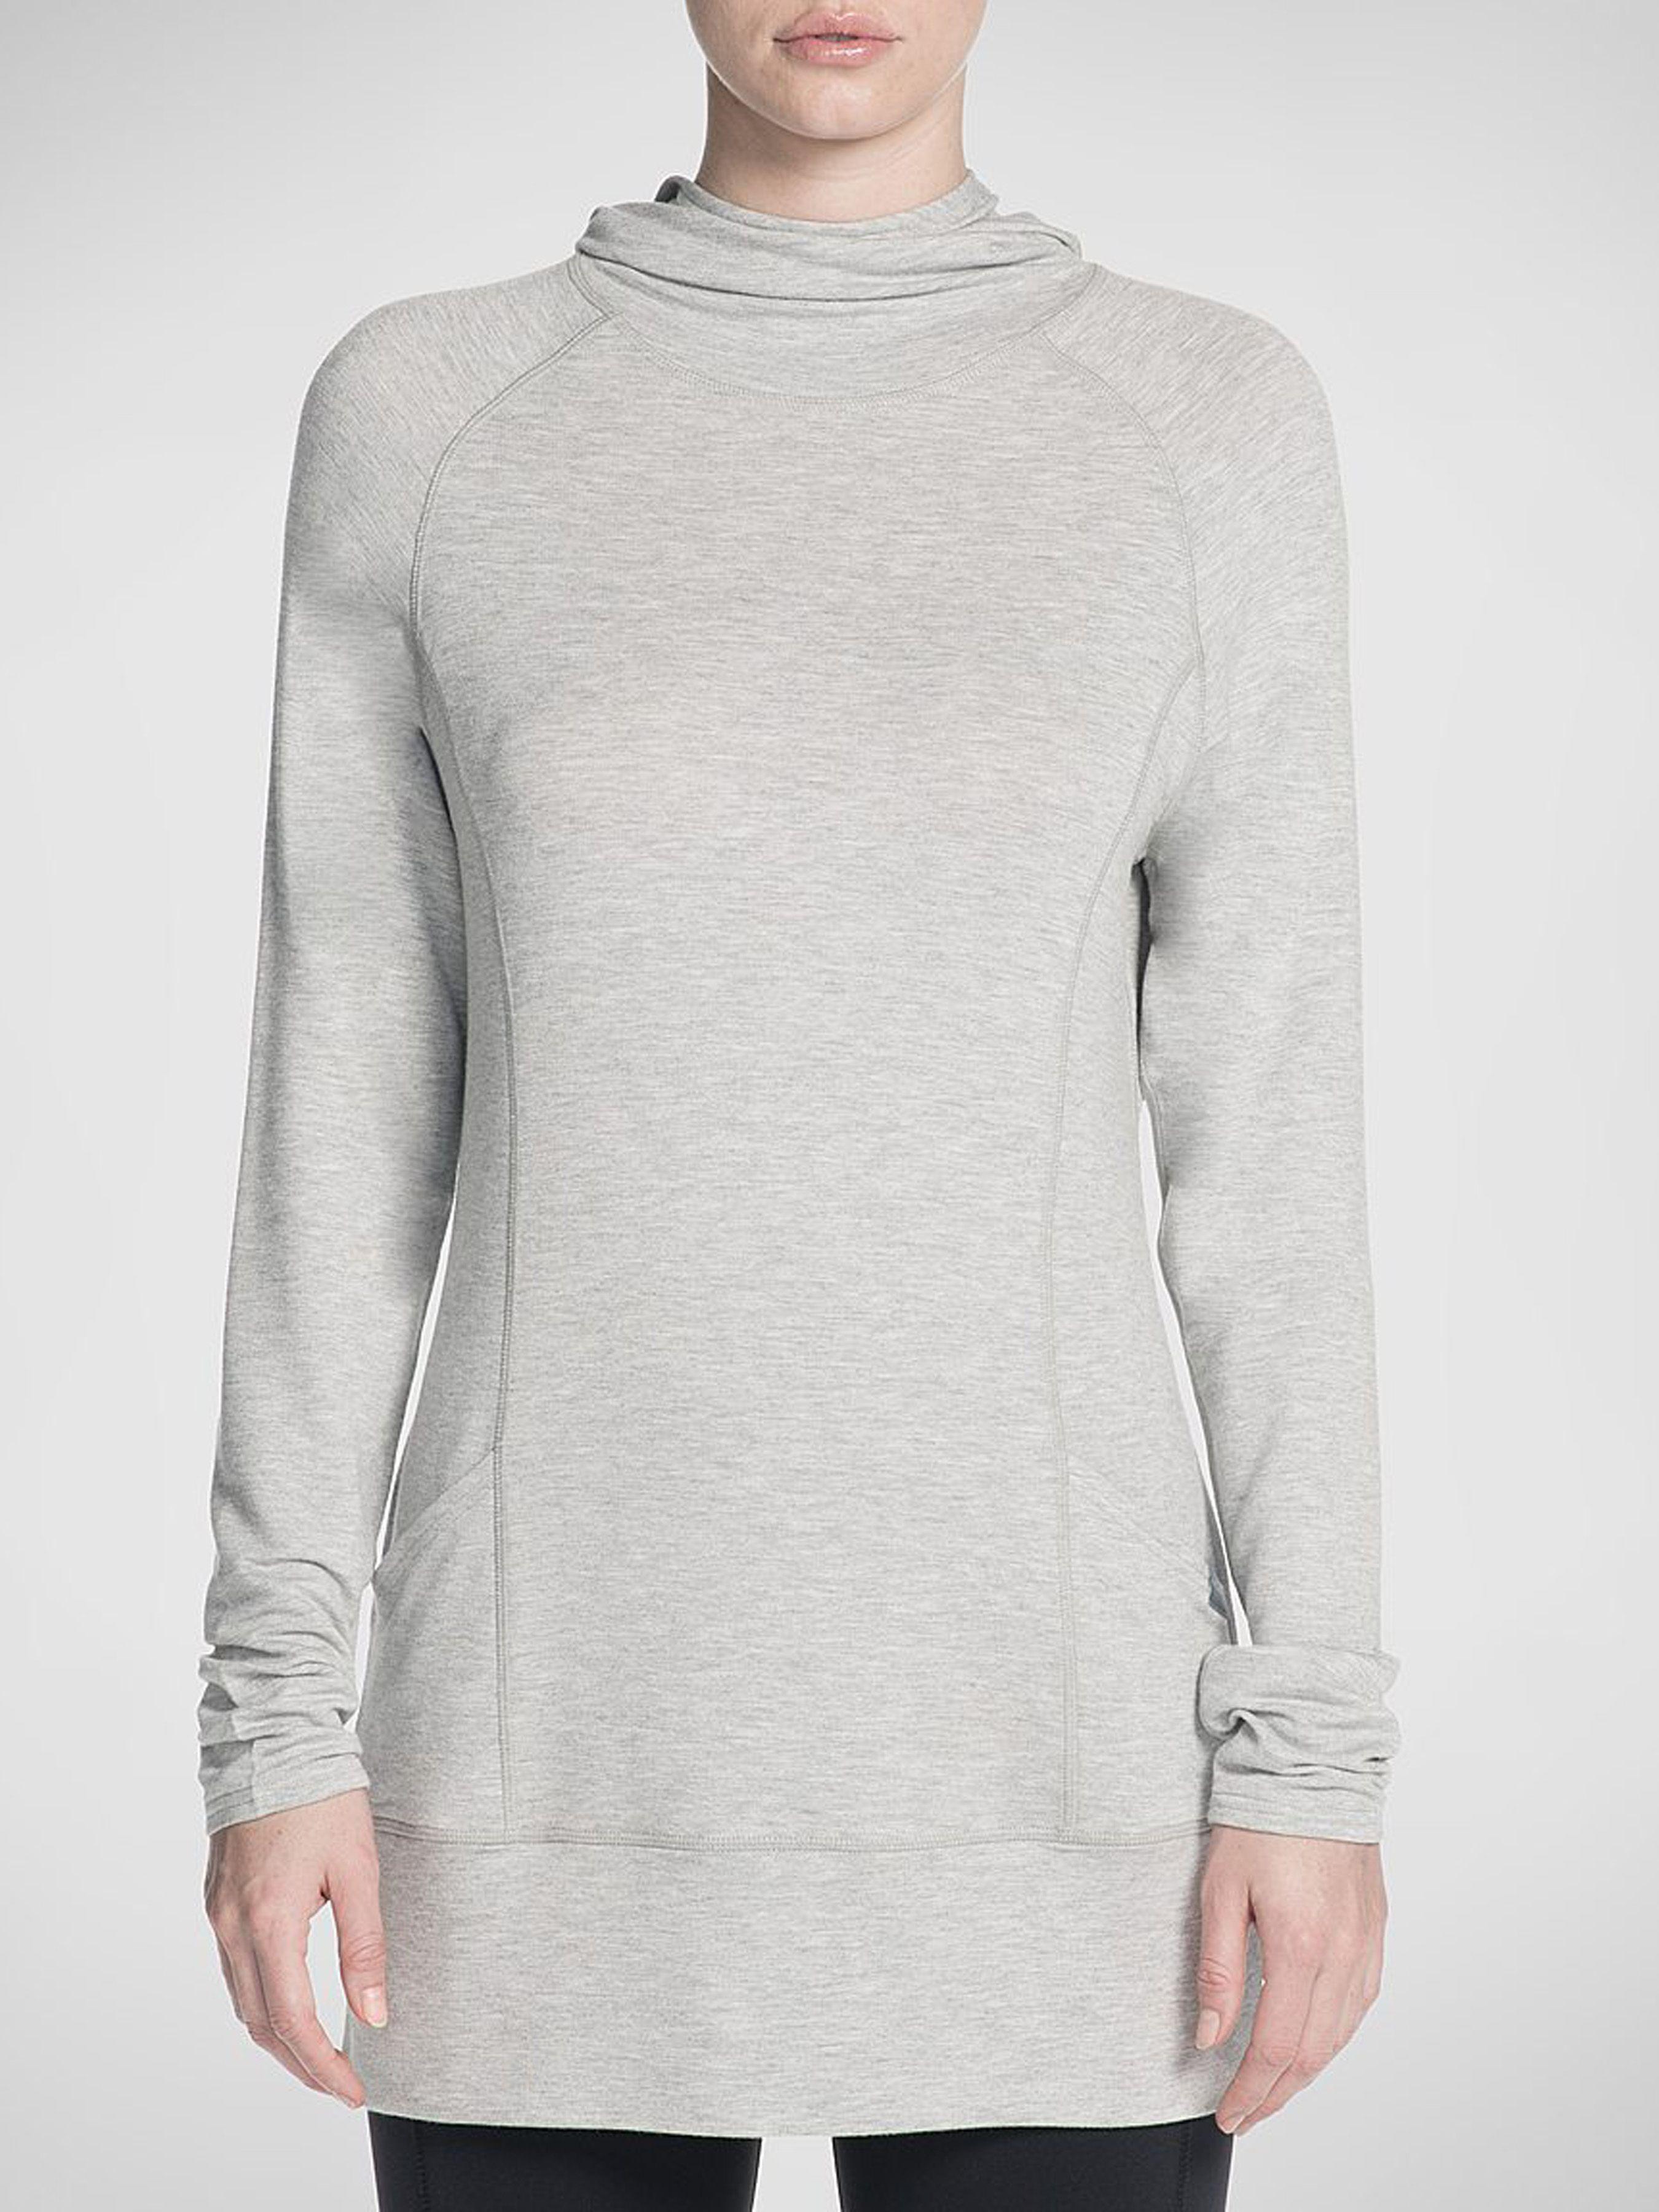 Пуловер женские Skechers модель KY77 приобрести, 2017